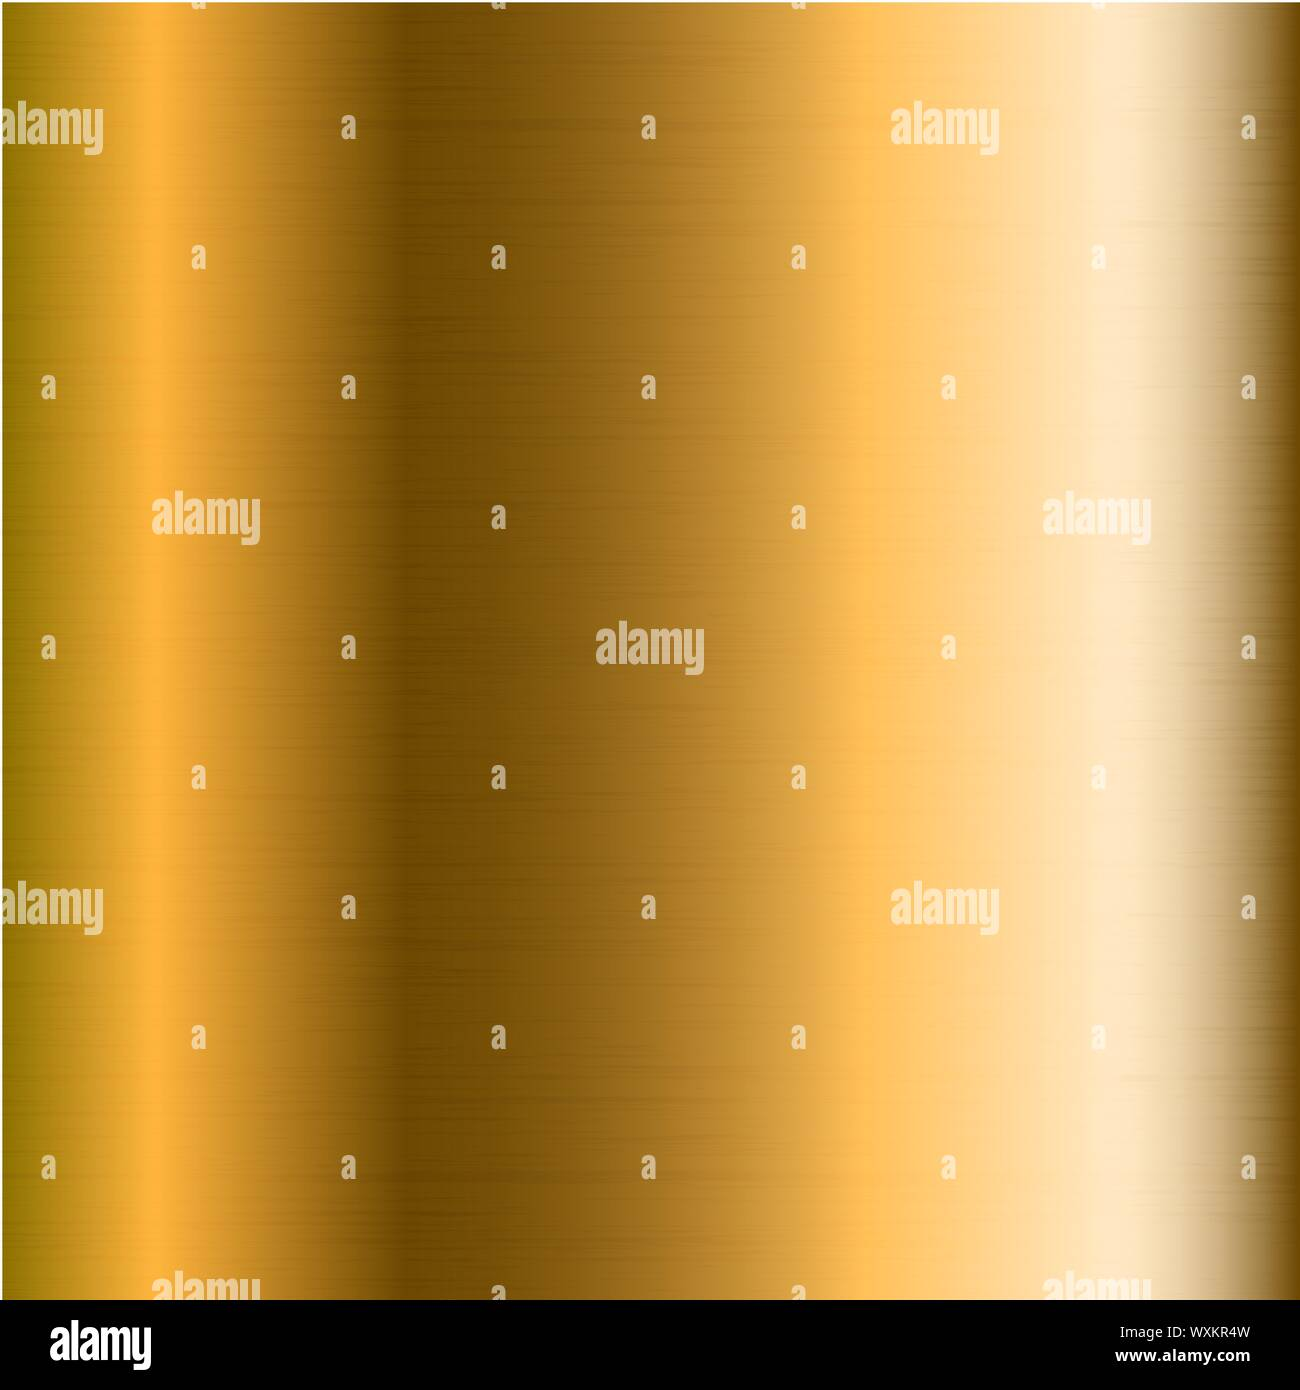 Realistic gold foil texture background  metal gradient